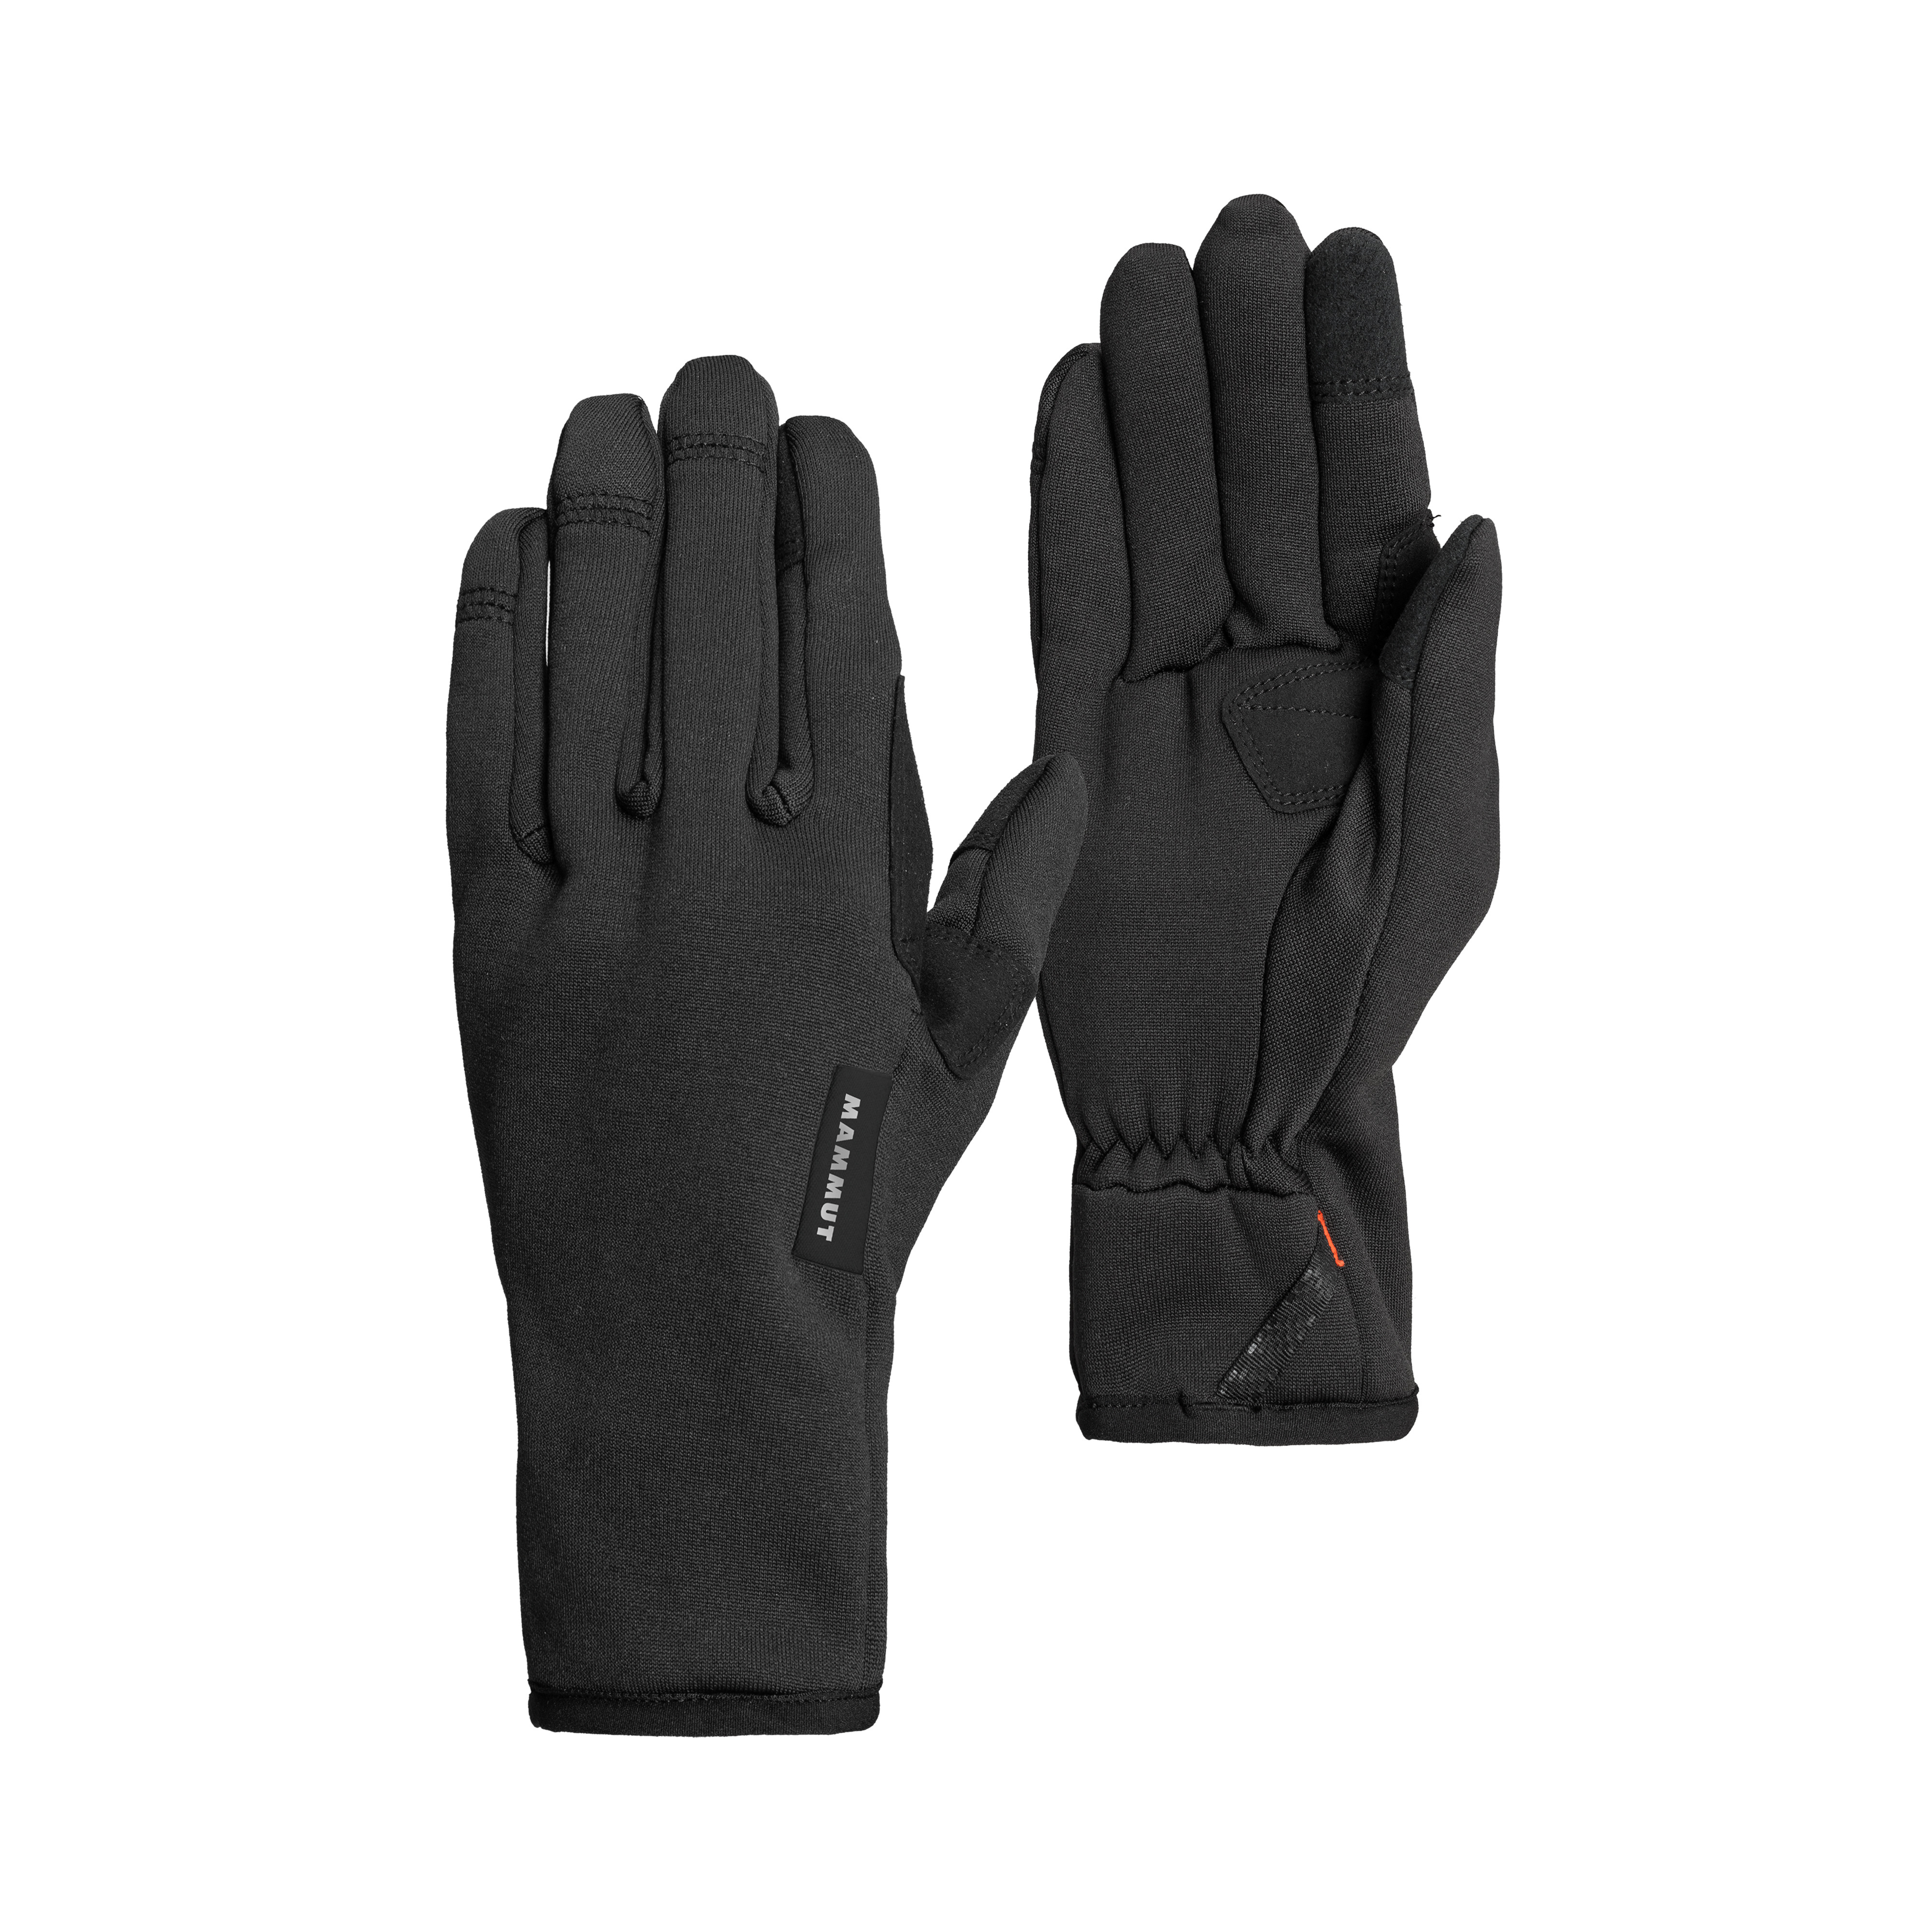 Fleece Pro Glove - 5, black thumbnail